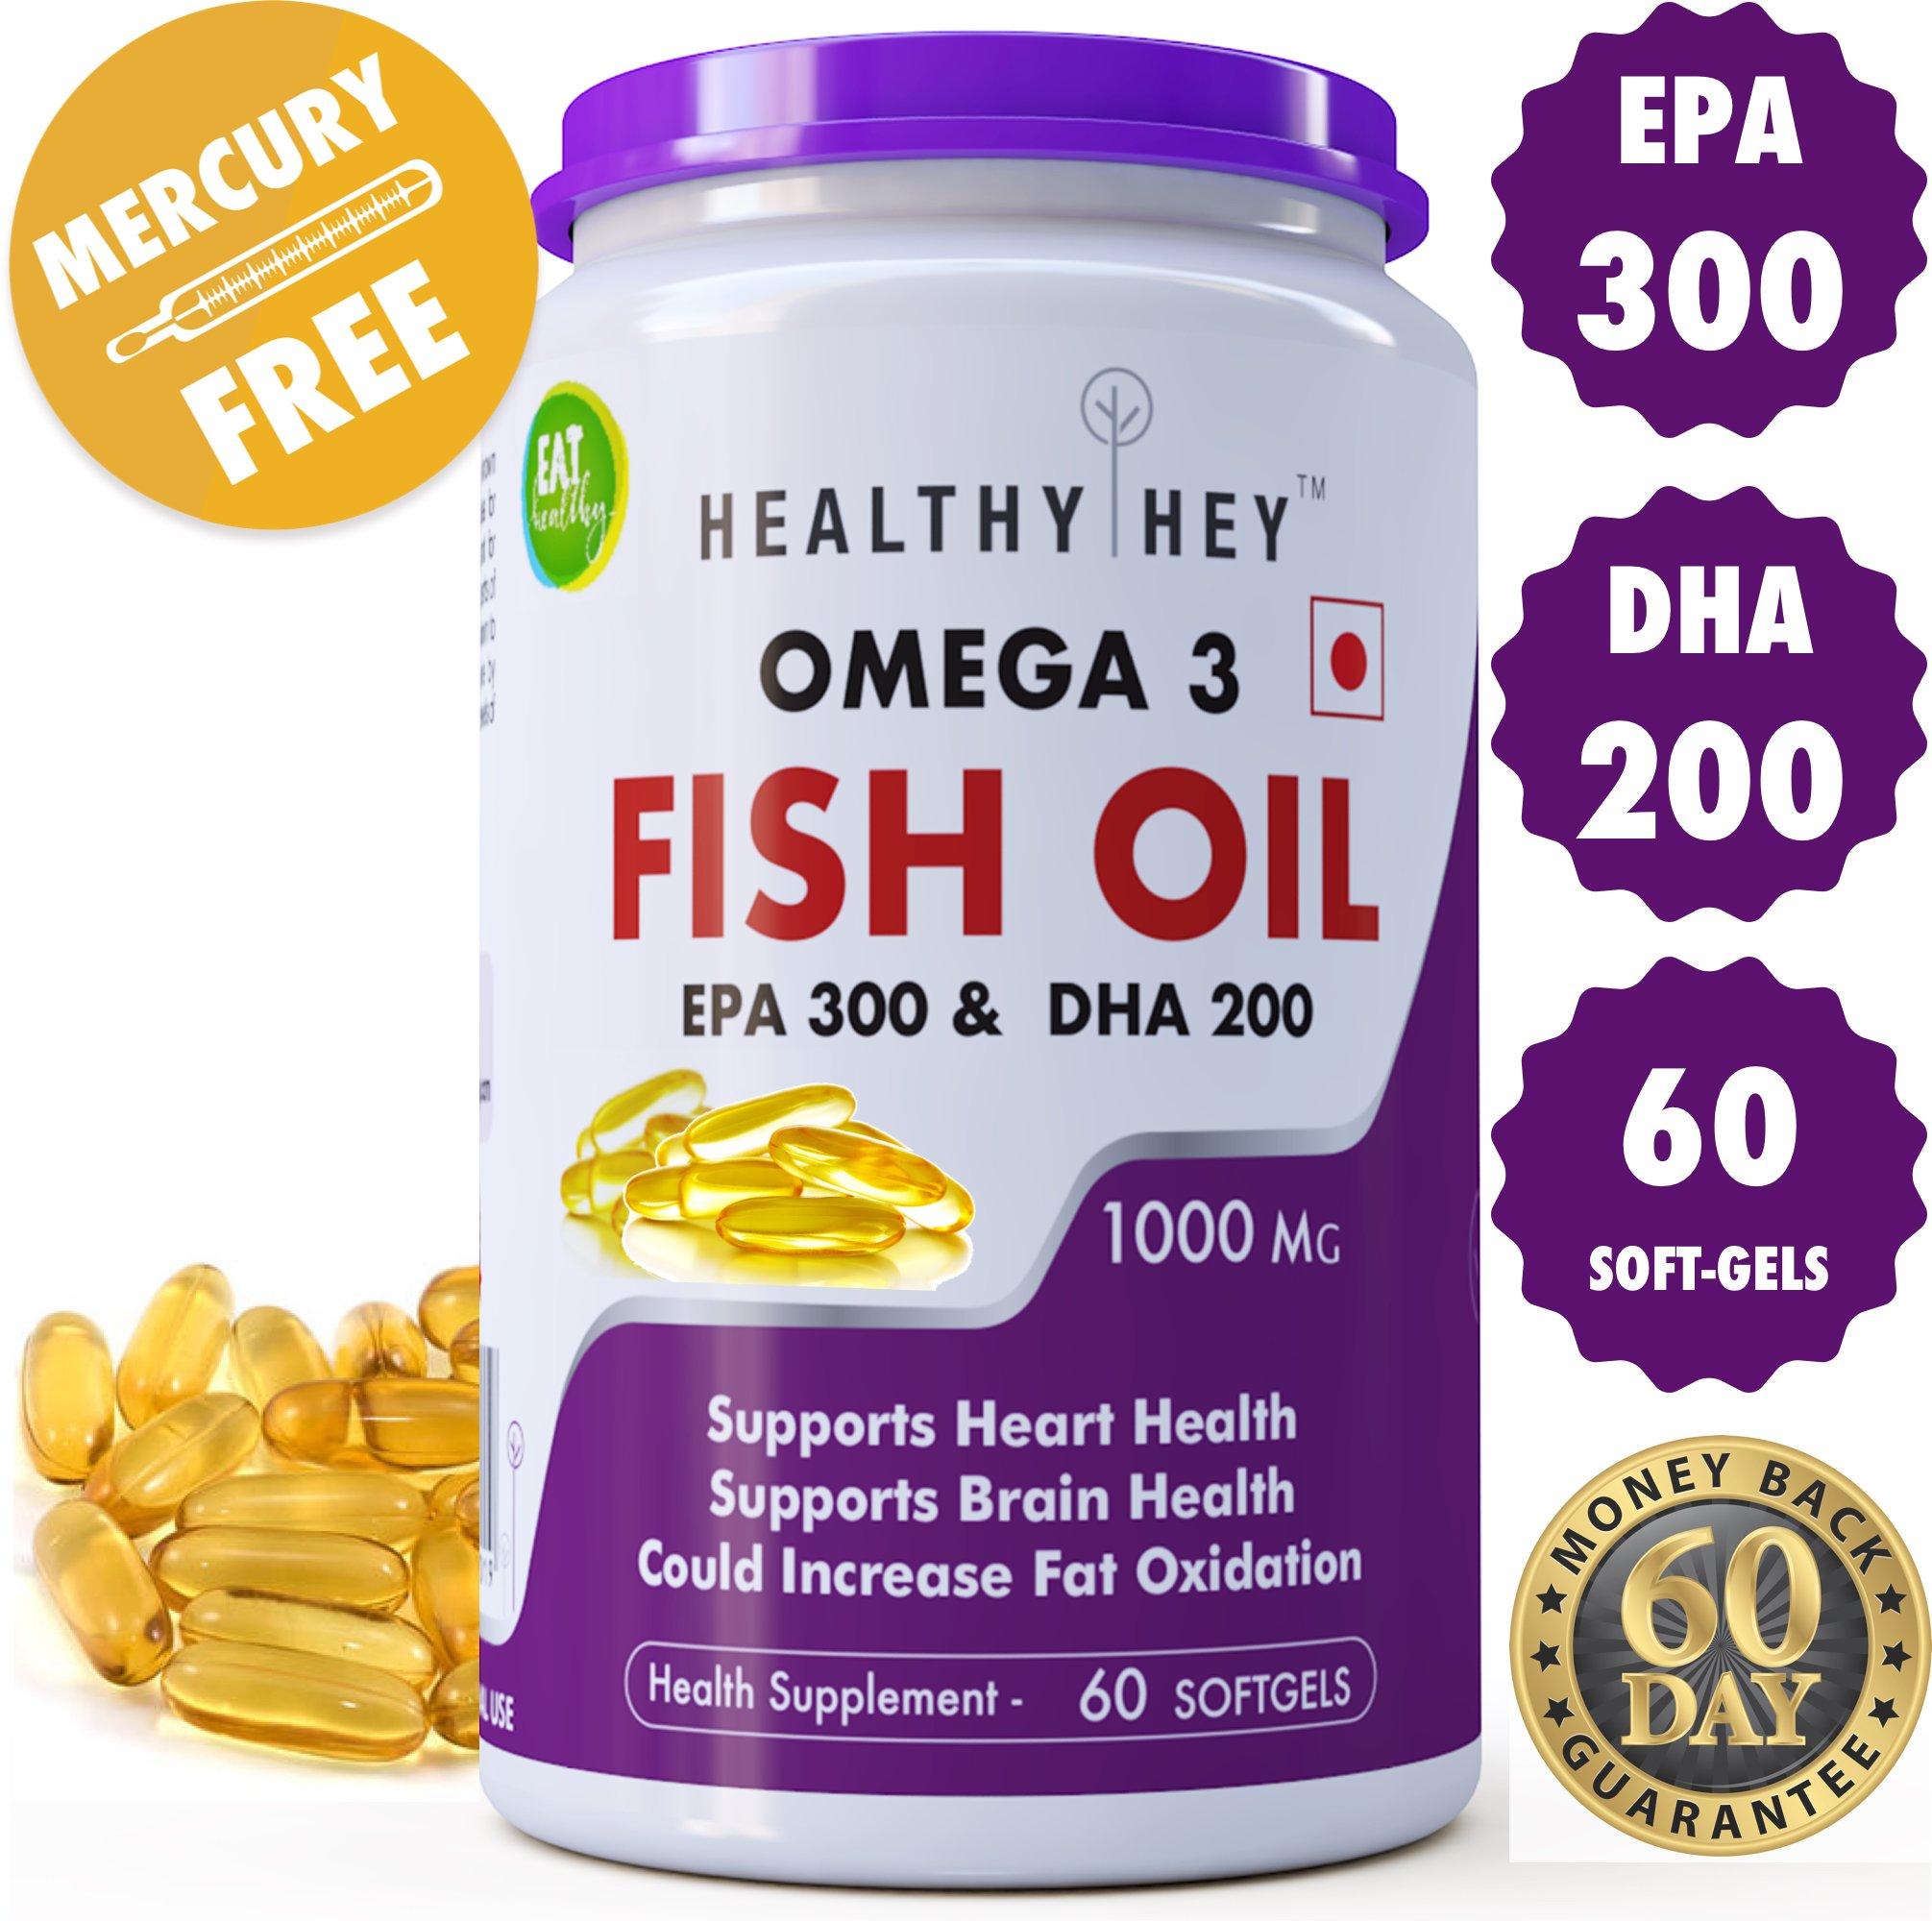 Healthyhey Nutrition Fish Oil - Omega 3 Mercury Free (1000 Mg) Burpless - 60 Softgel product image